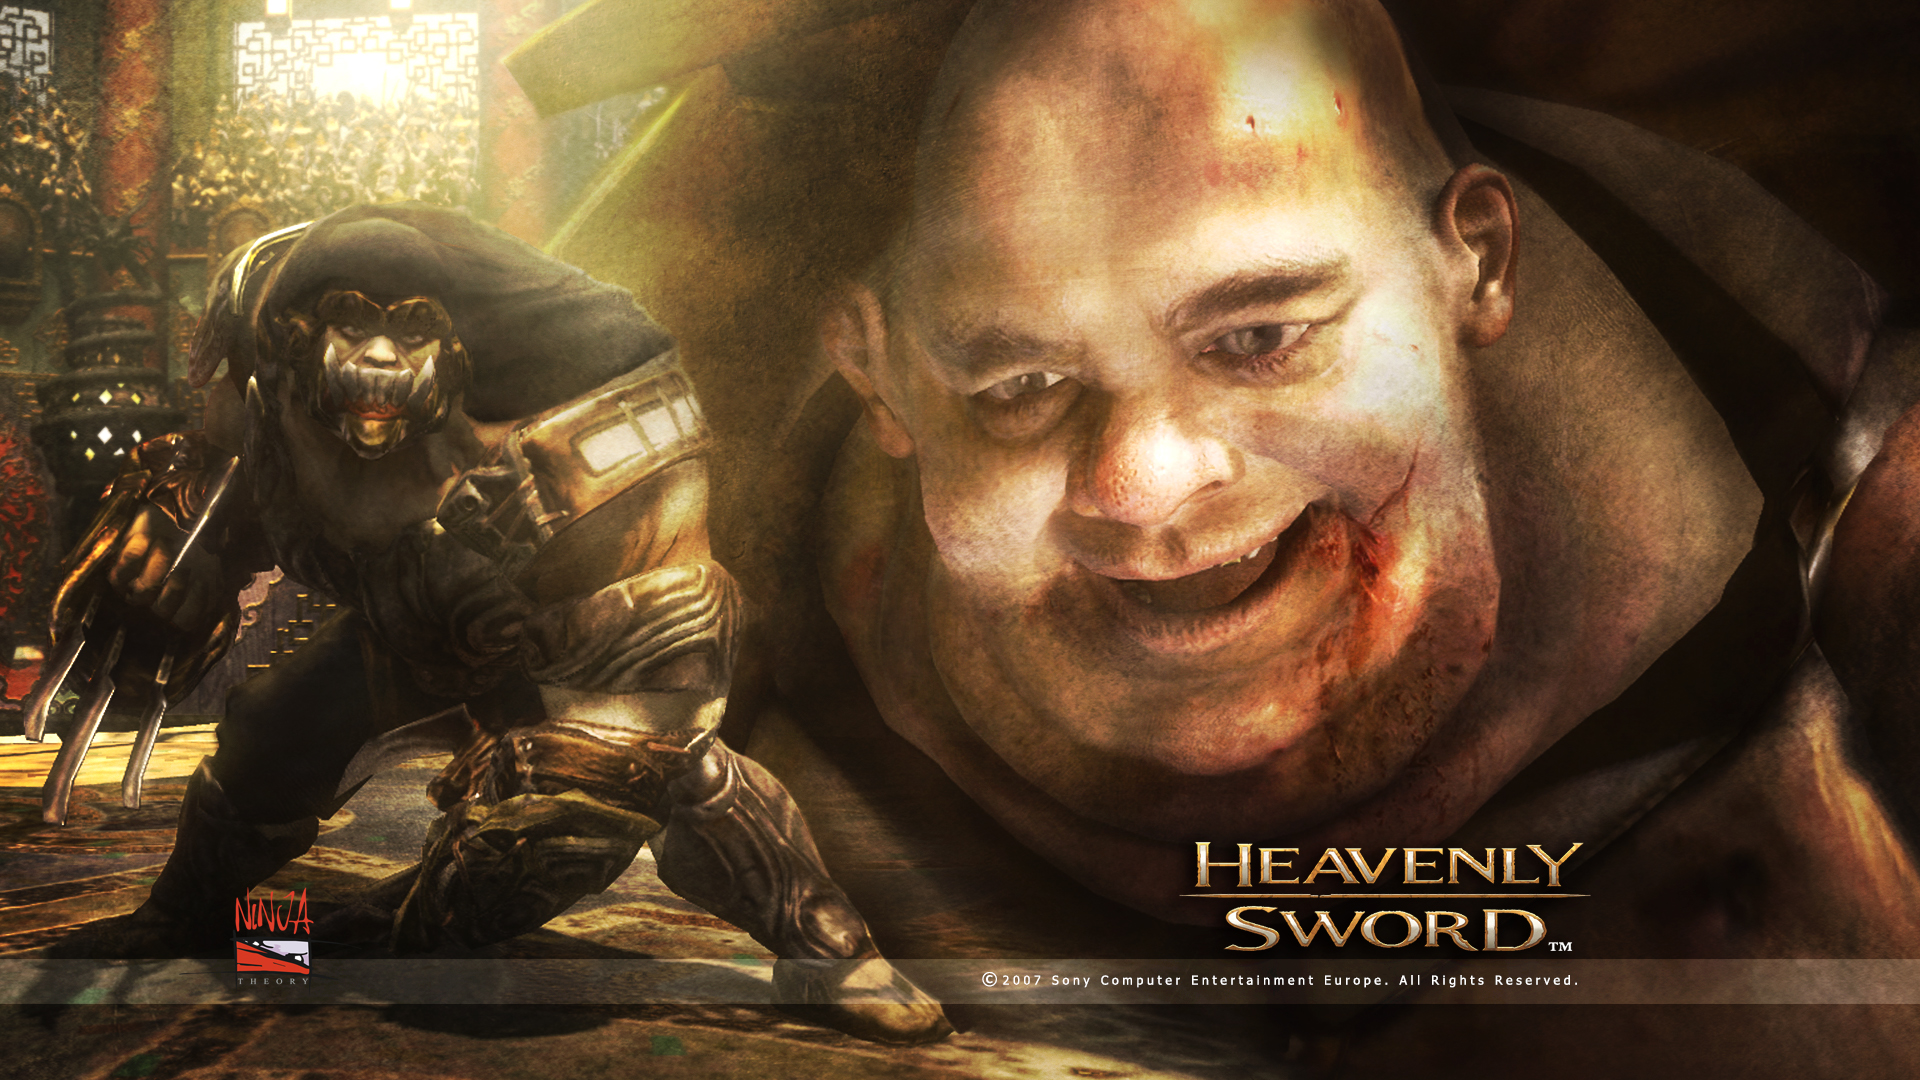 <b>Heavenly Sword</b> images <b>Heavenly Sword HD</b> wallpaper and background ...